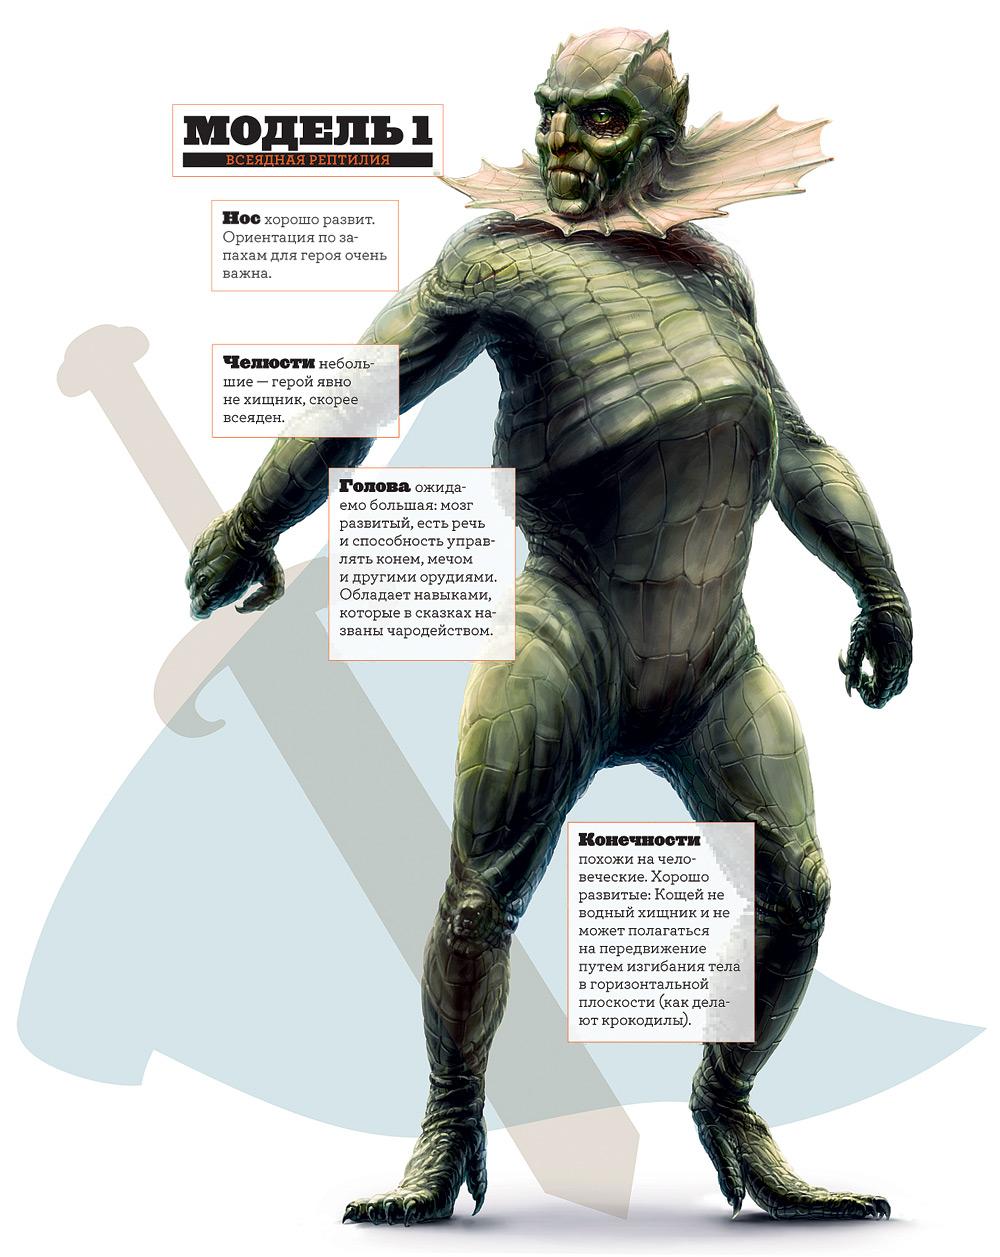 hero-koschei-reptiloid-1.jpg